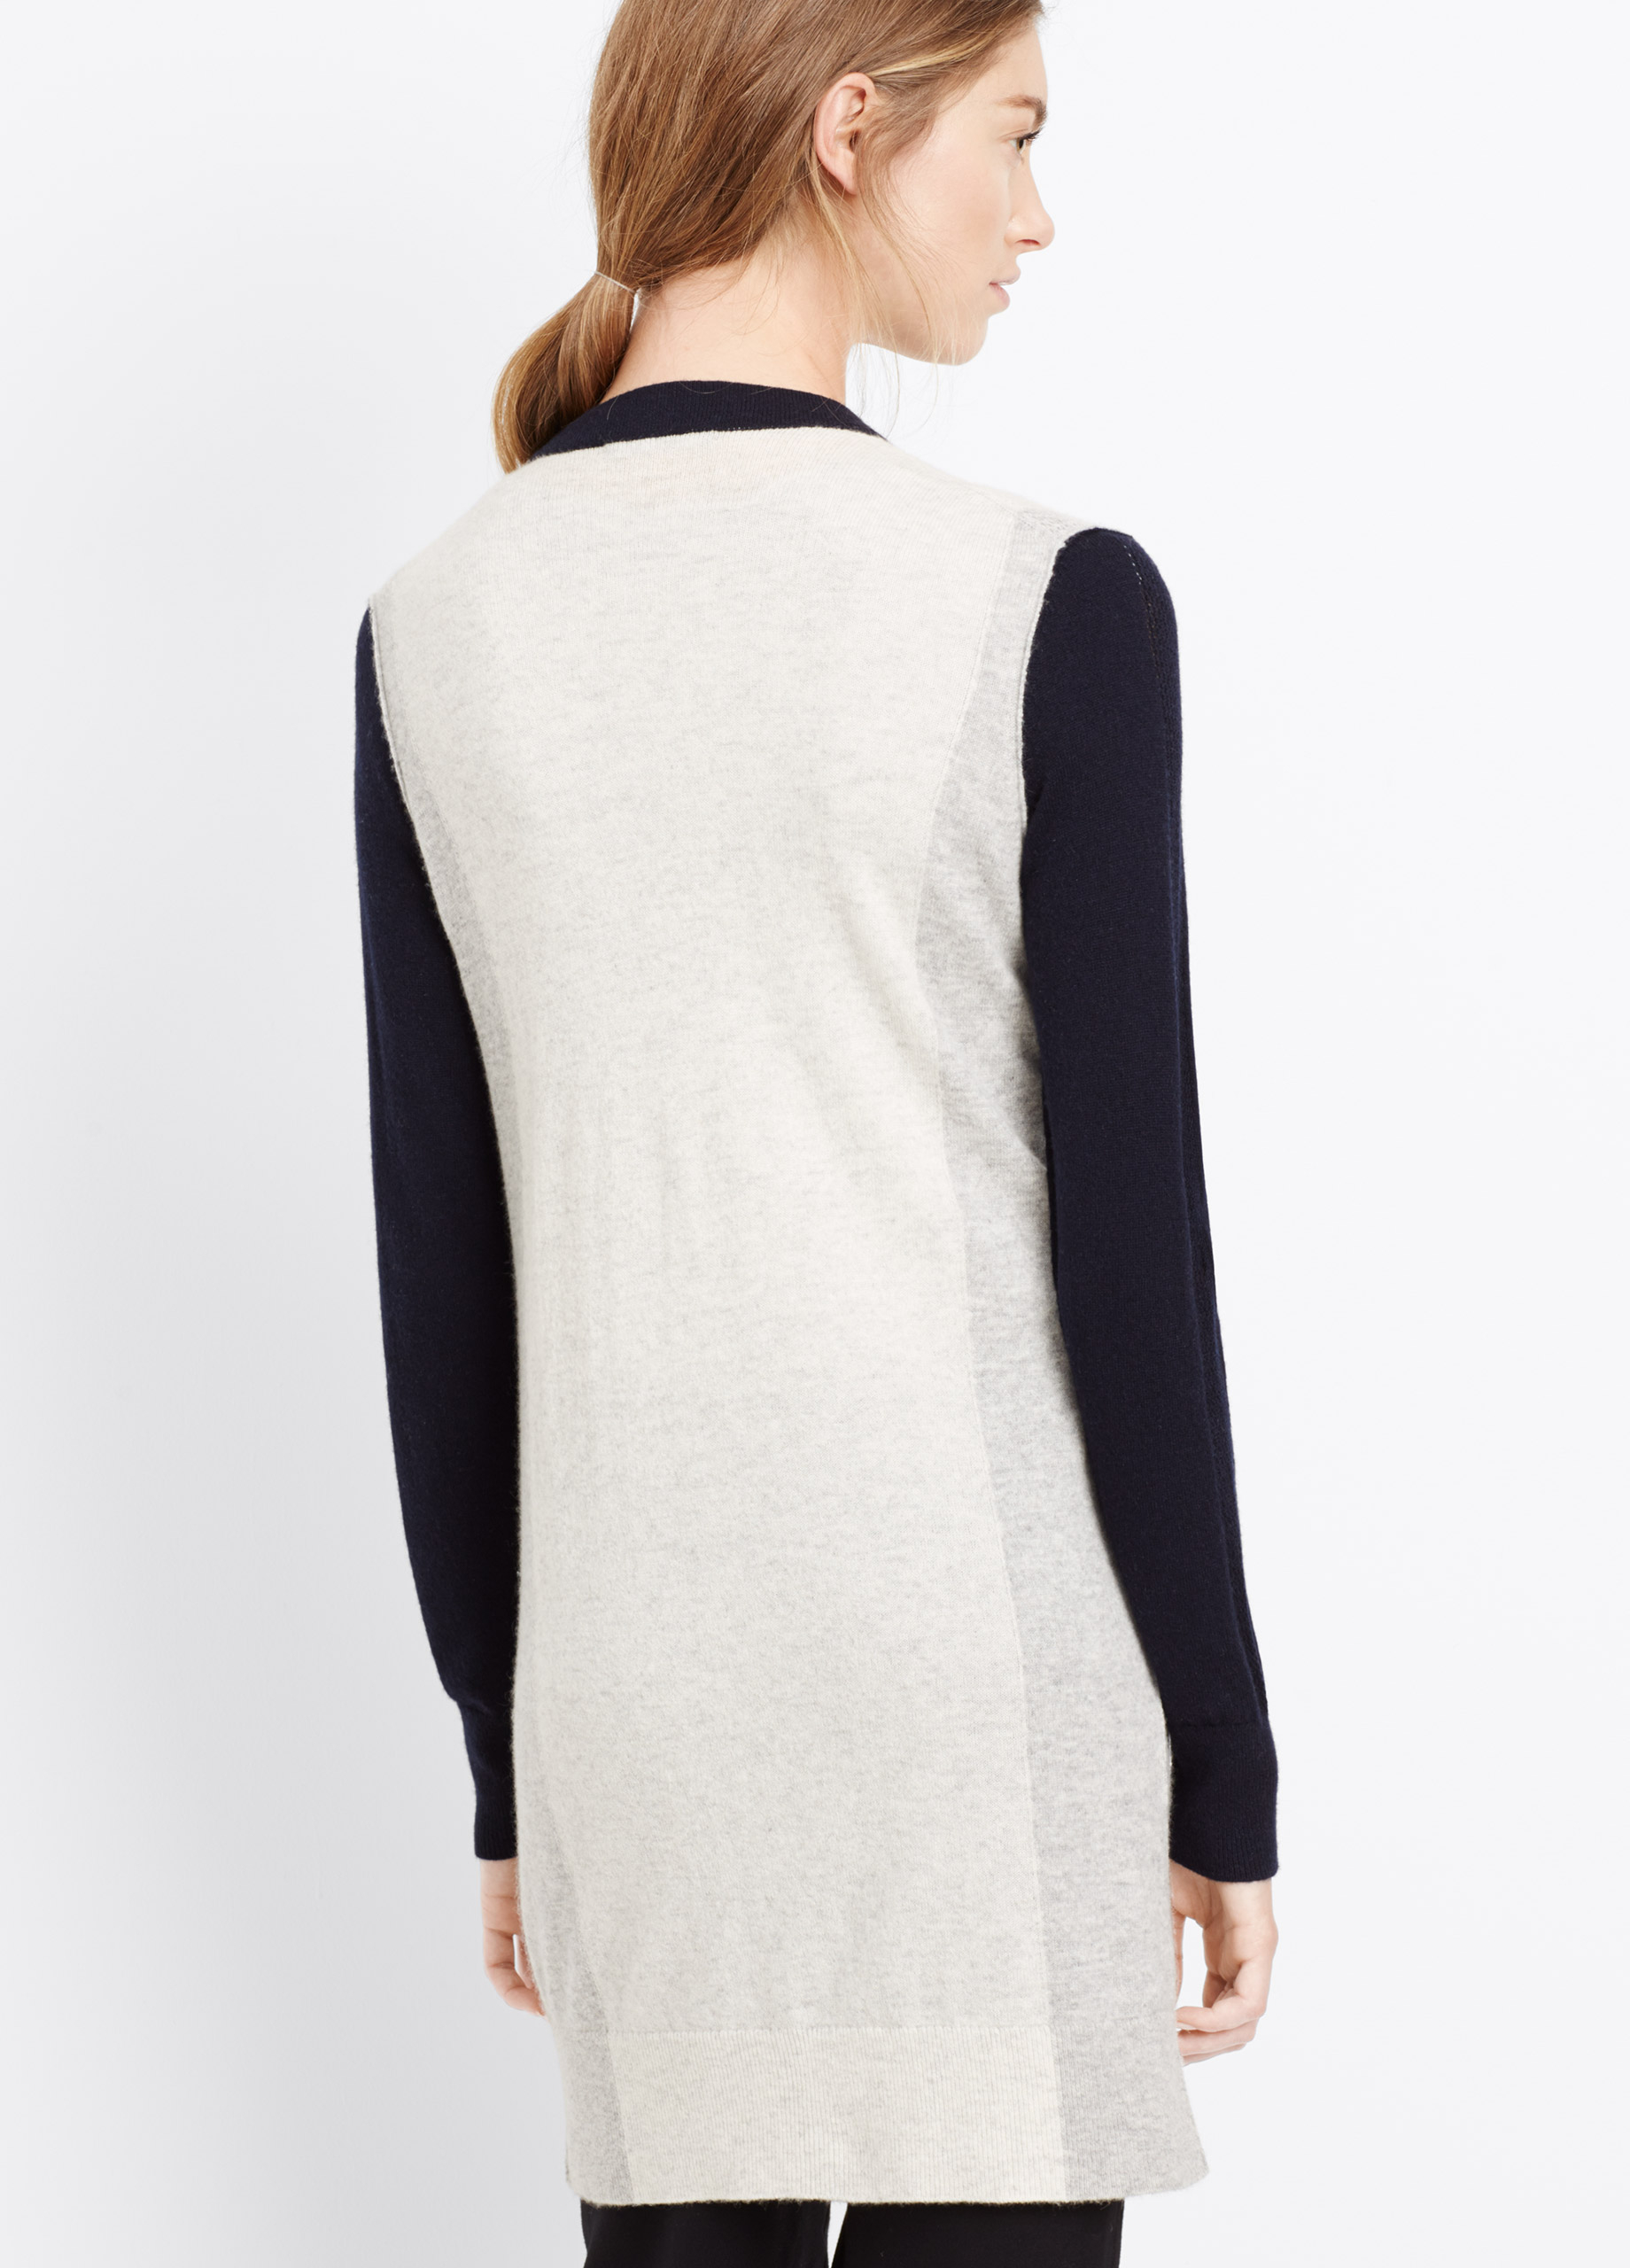 Vince colorblock cashmere sweater dress